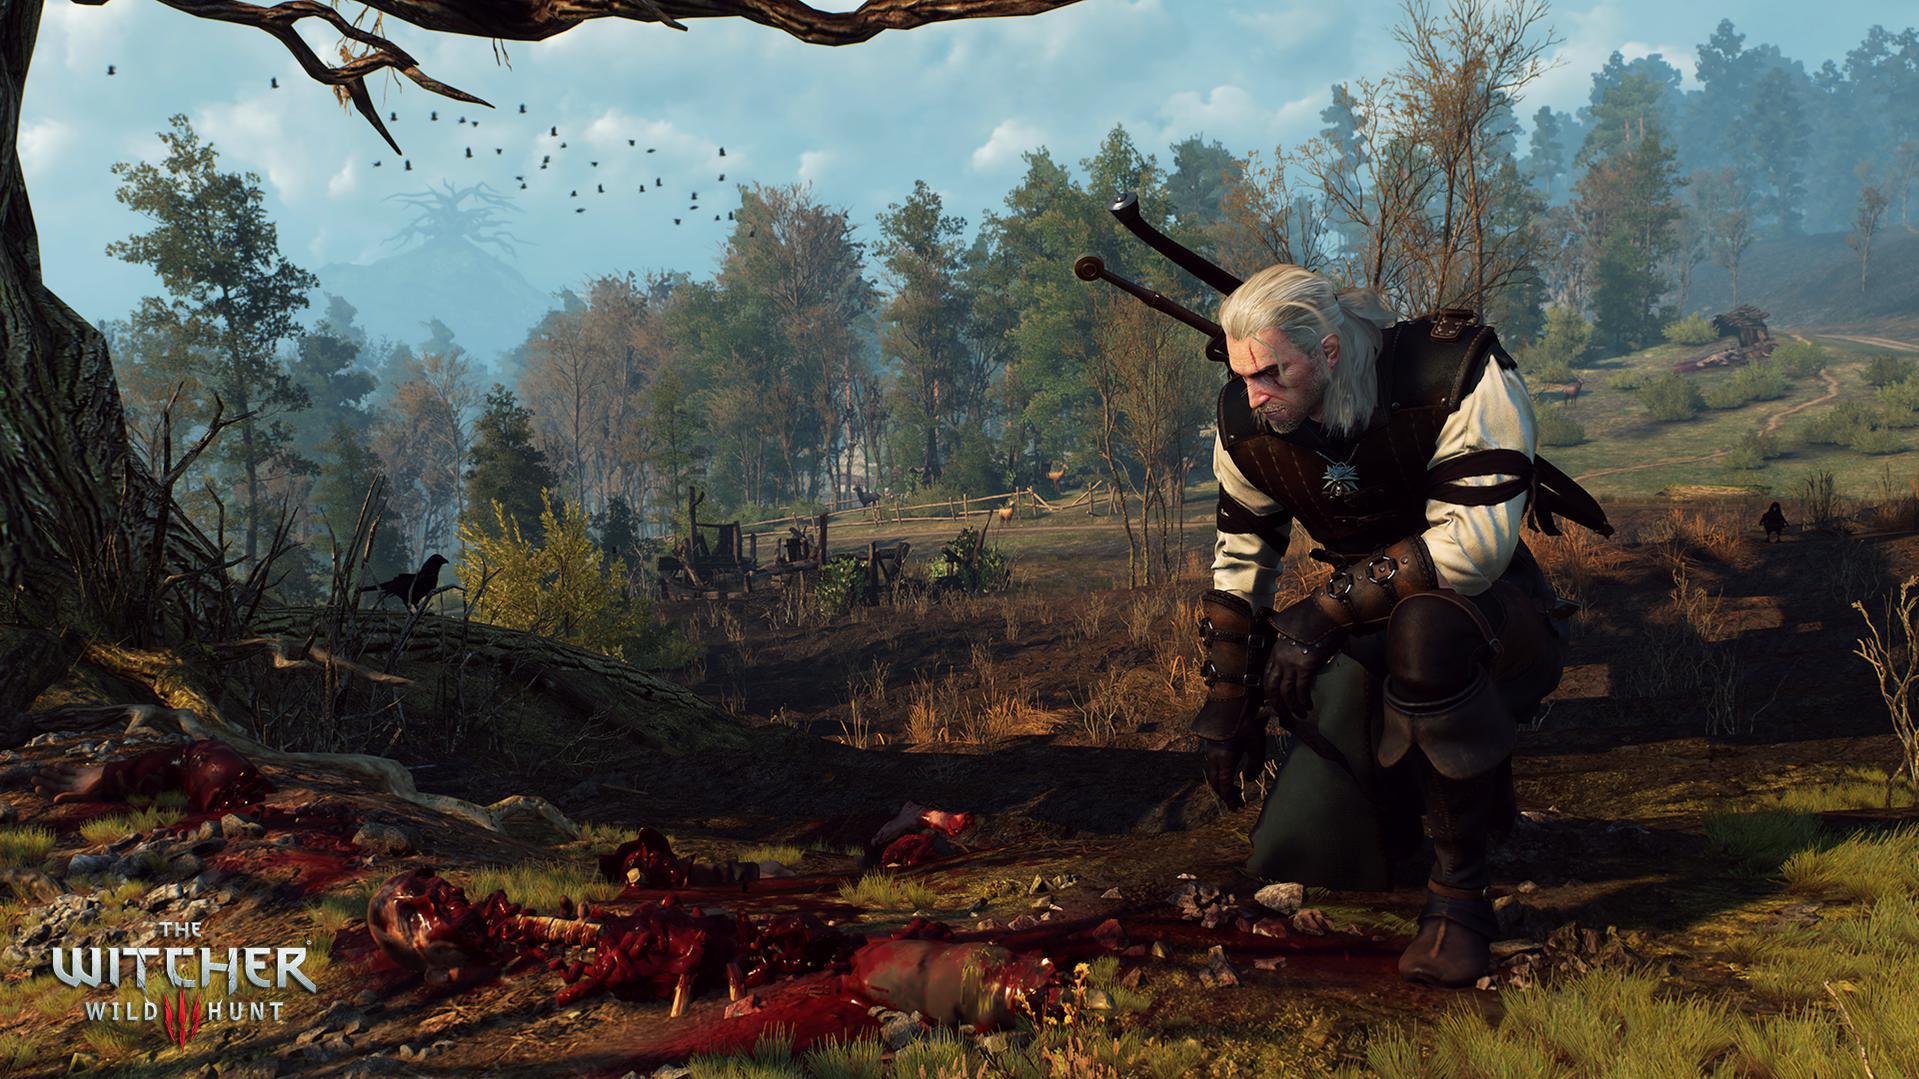 The Witcher 3: Wild Hunt. Презентация CD PROJEKT RED.     CD PROJEKT RED совместно с GOG.com проведут онлайн трансля ... - Изображение 5